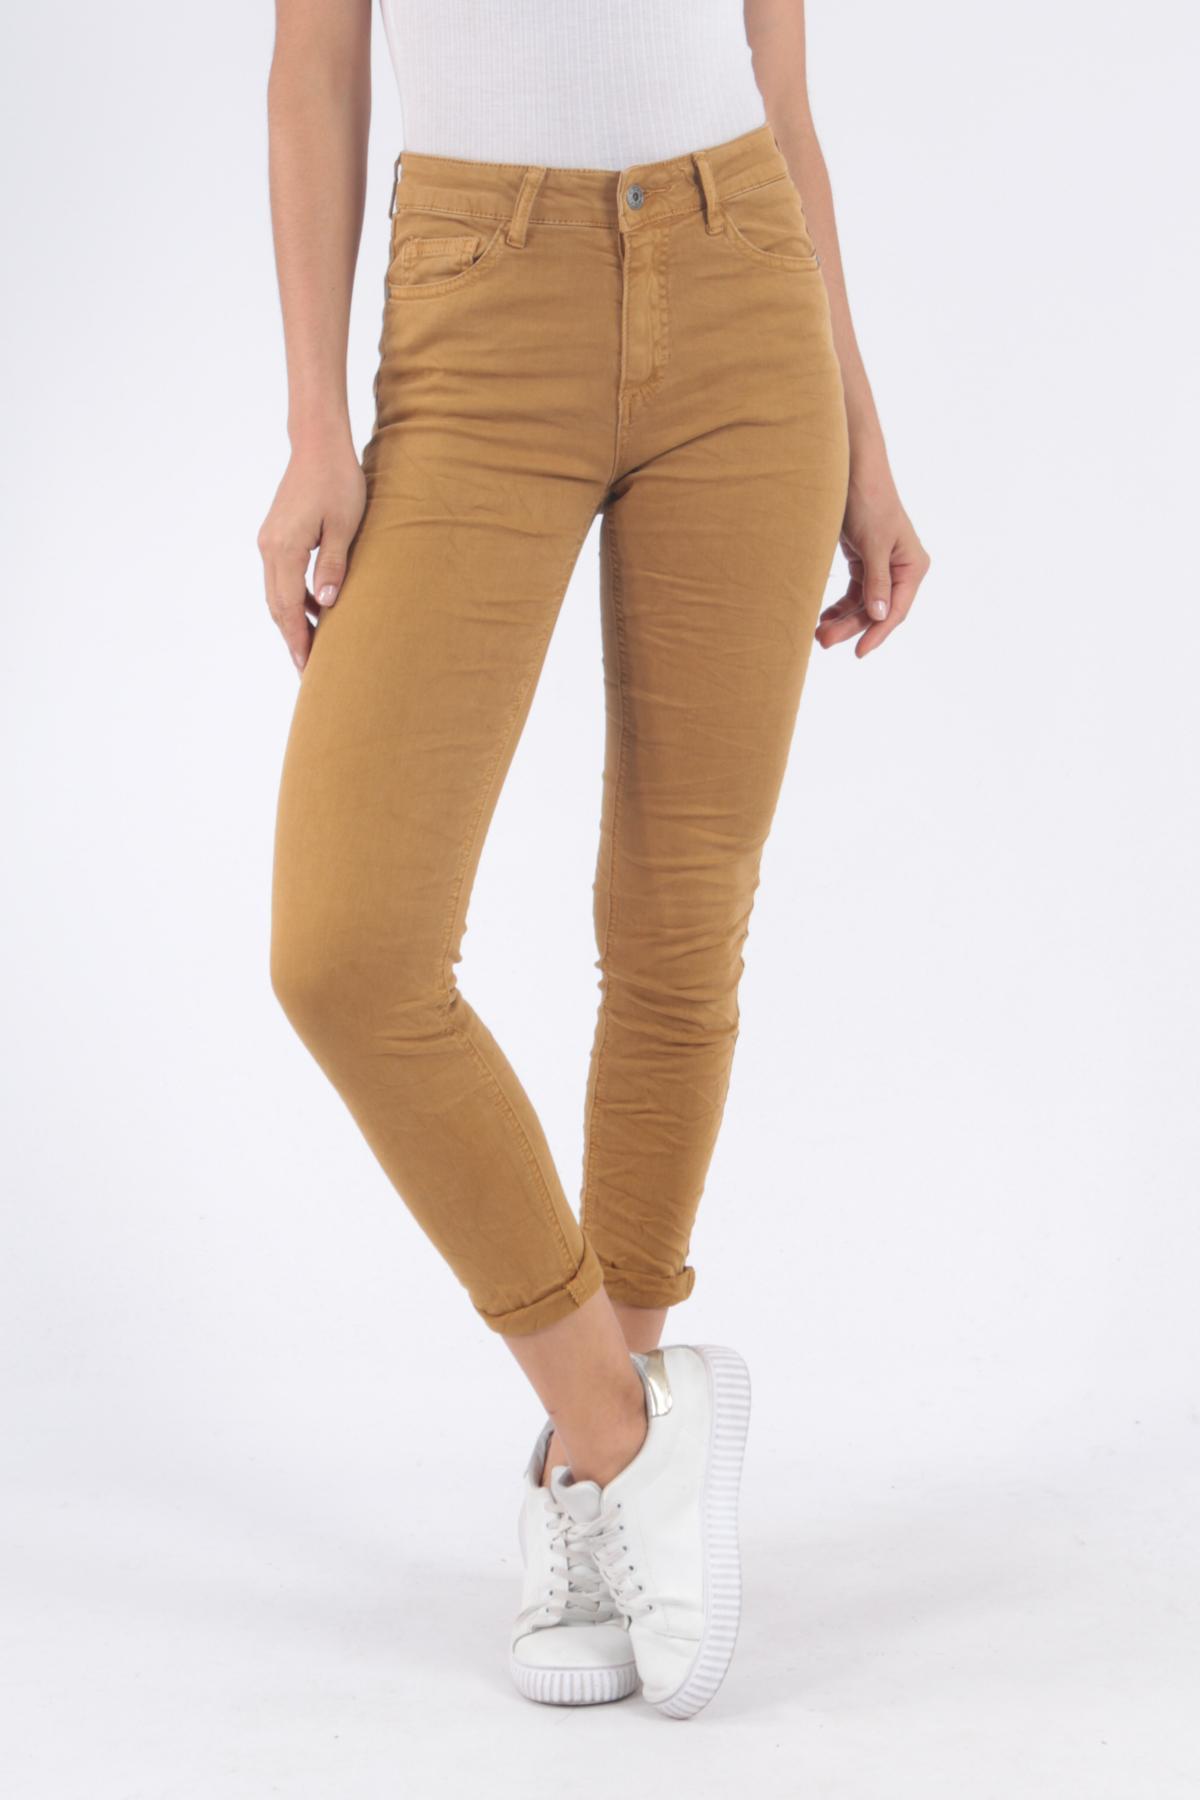 Pantalons Femme 8170-SAFRAN Areline Diffuse Melly & Co / Garline